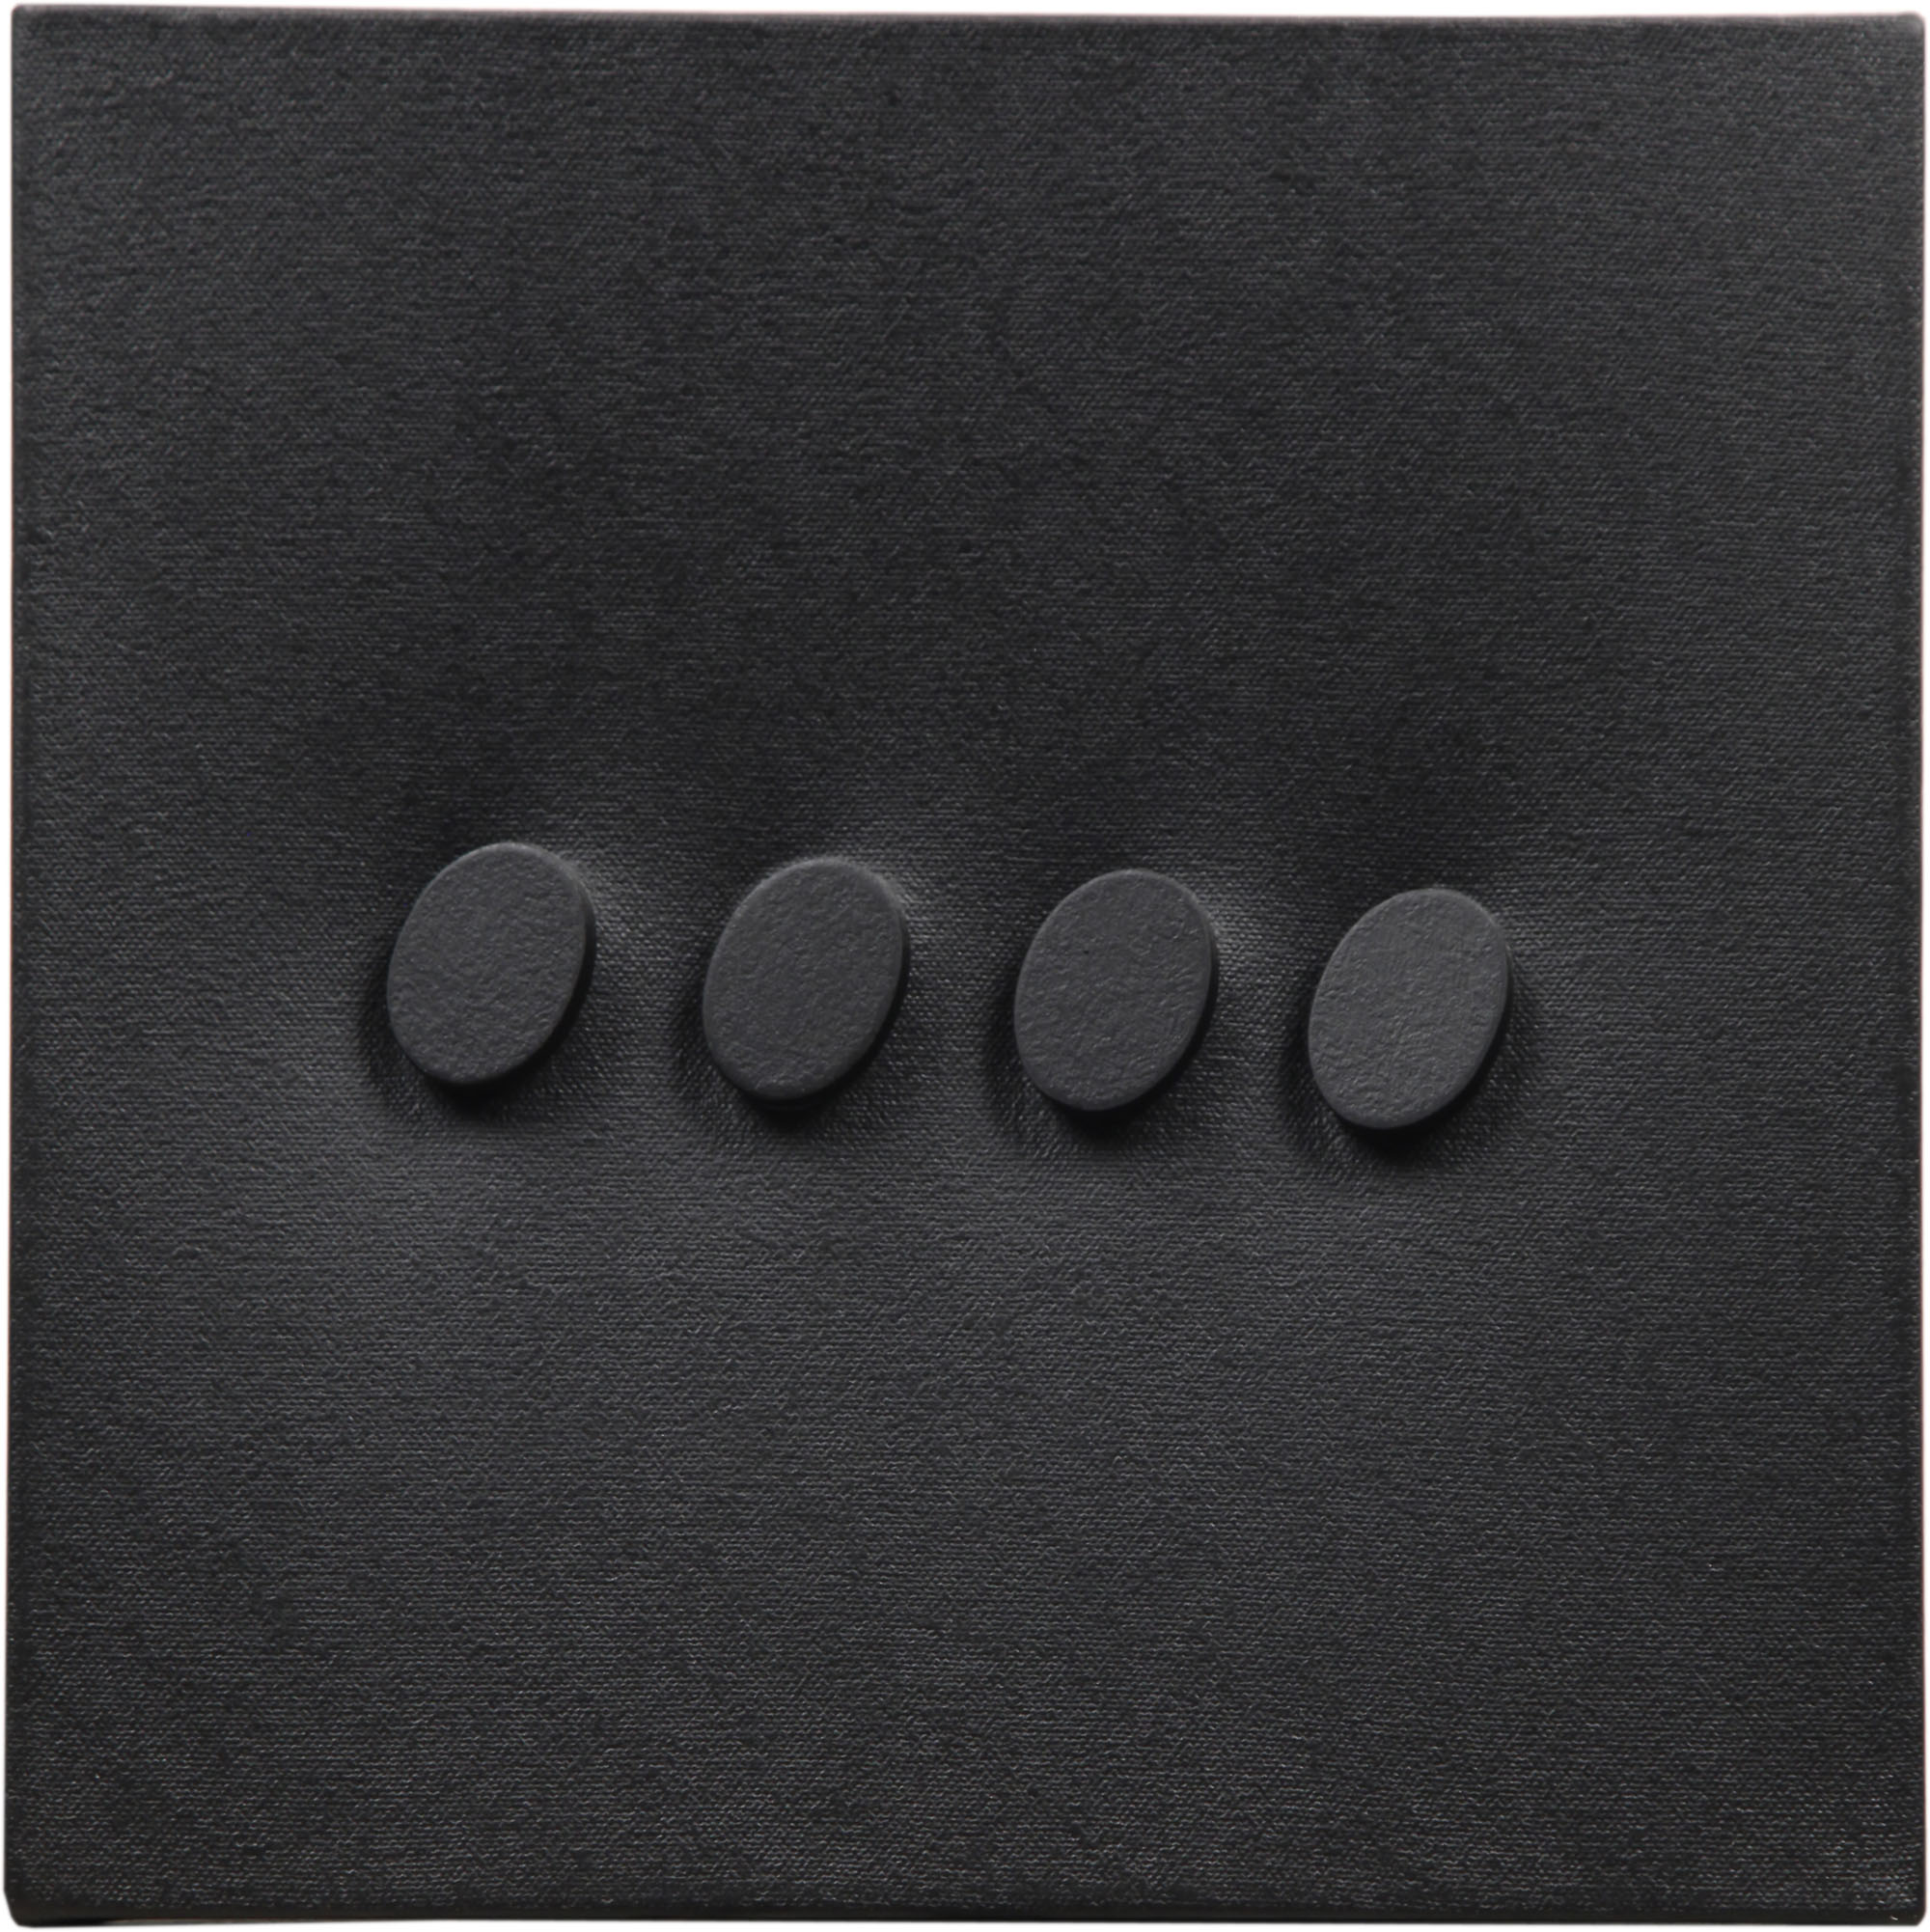 Turi Simeti, 4 ovali neri, 2016, 30x30 cm. Courtesy Archivio Turi Simeti